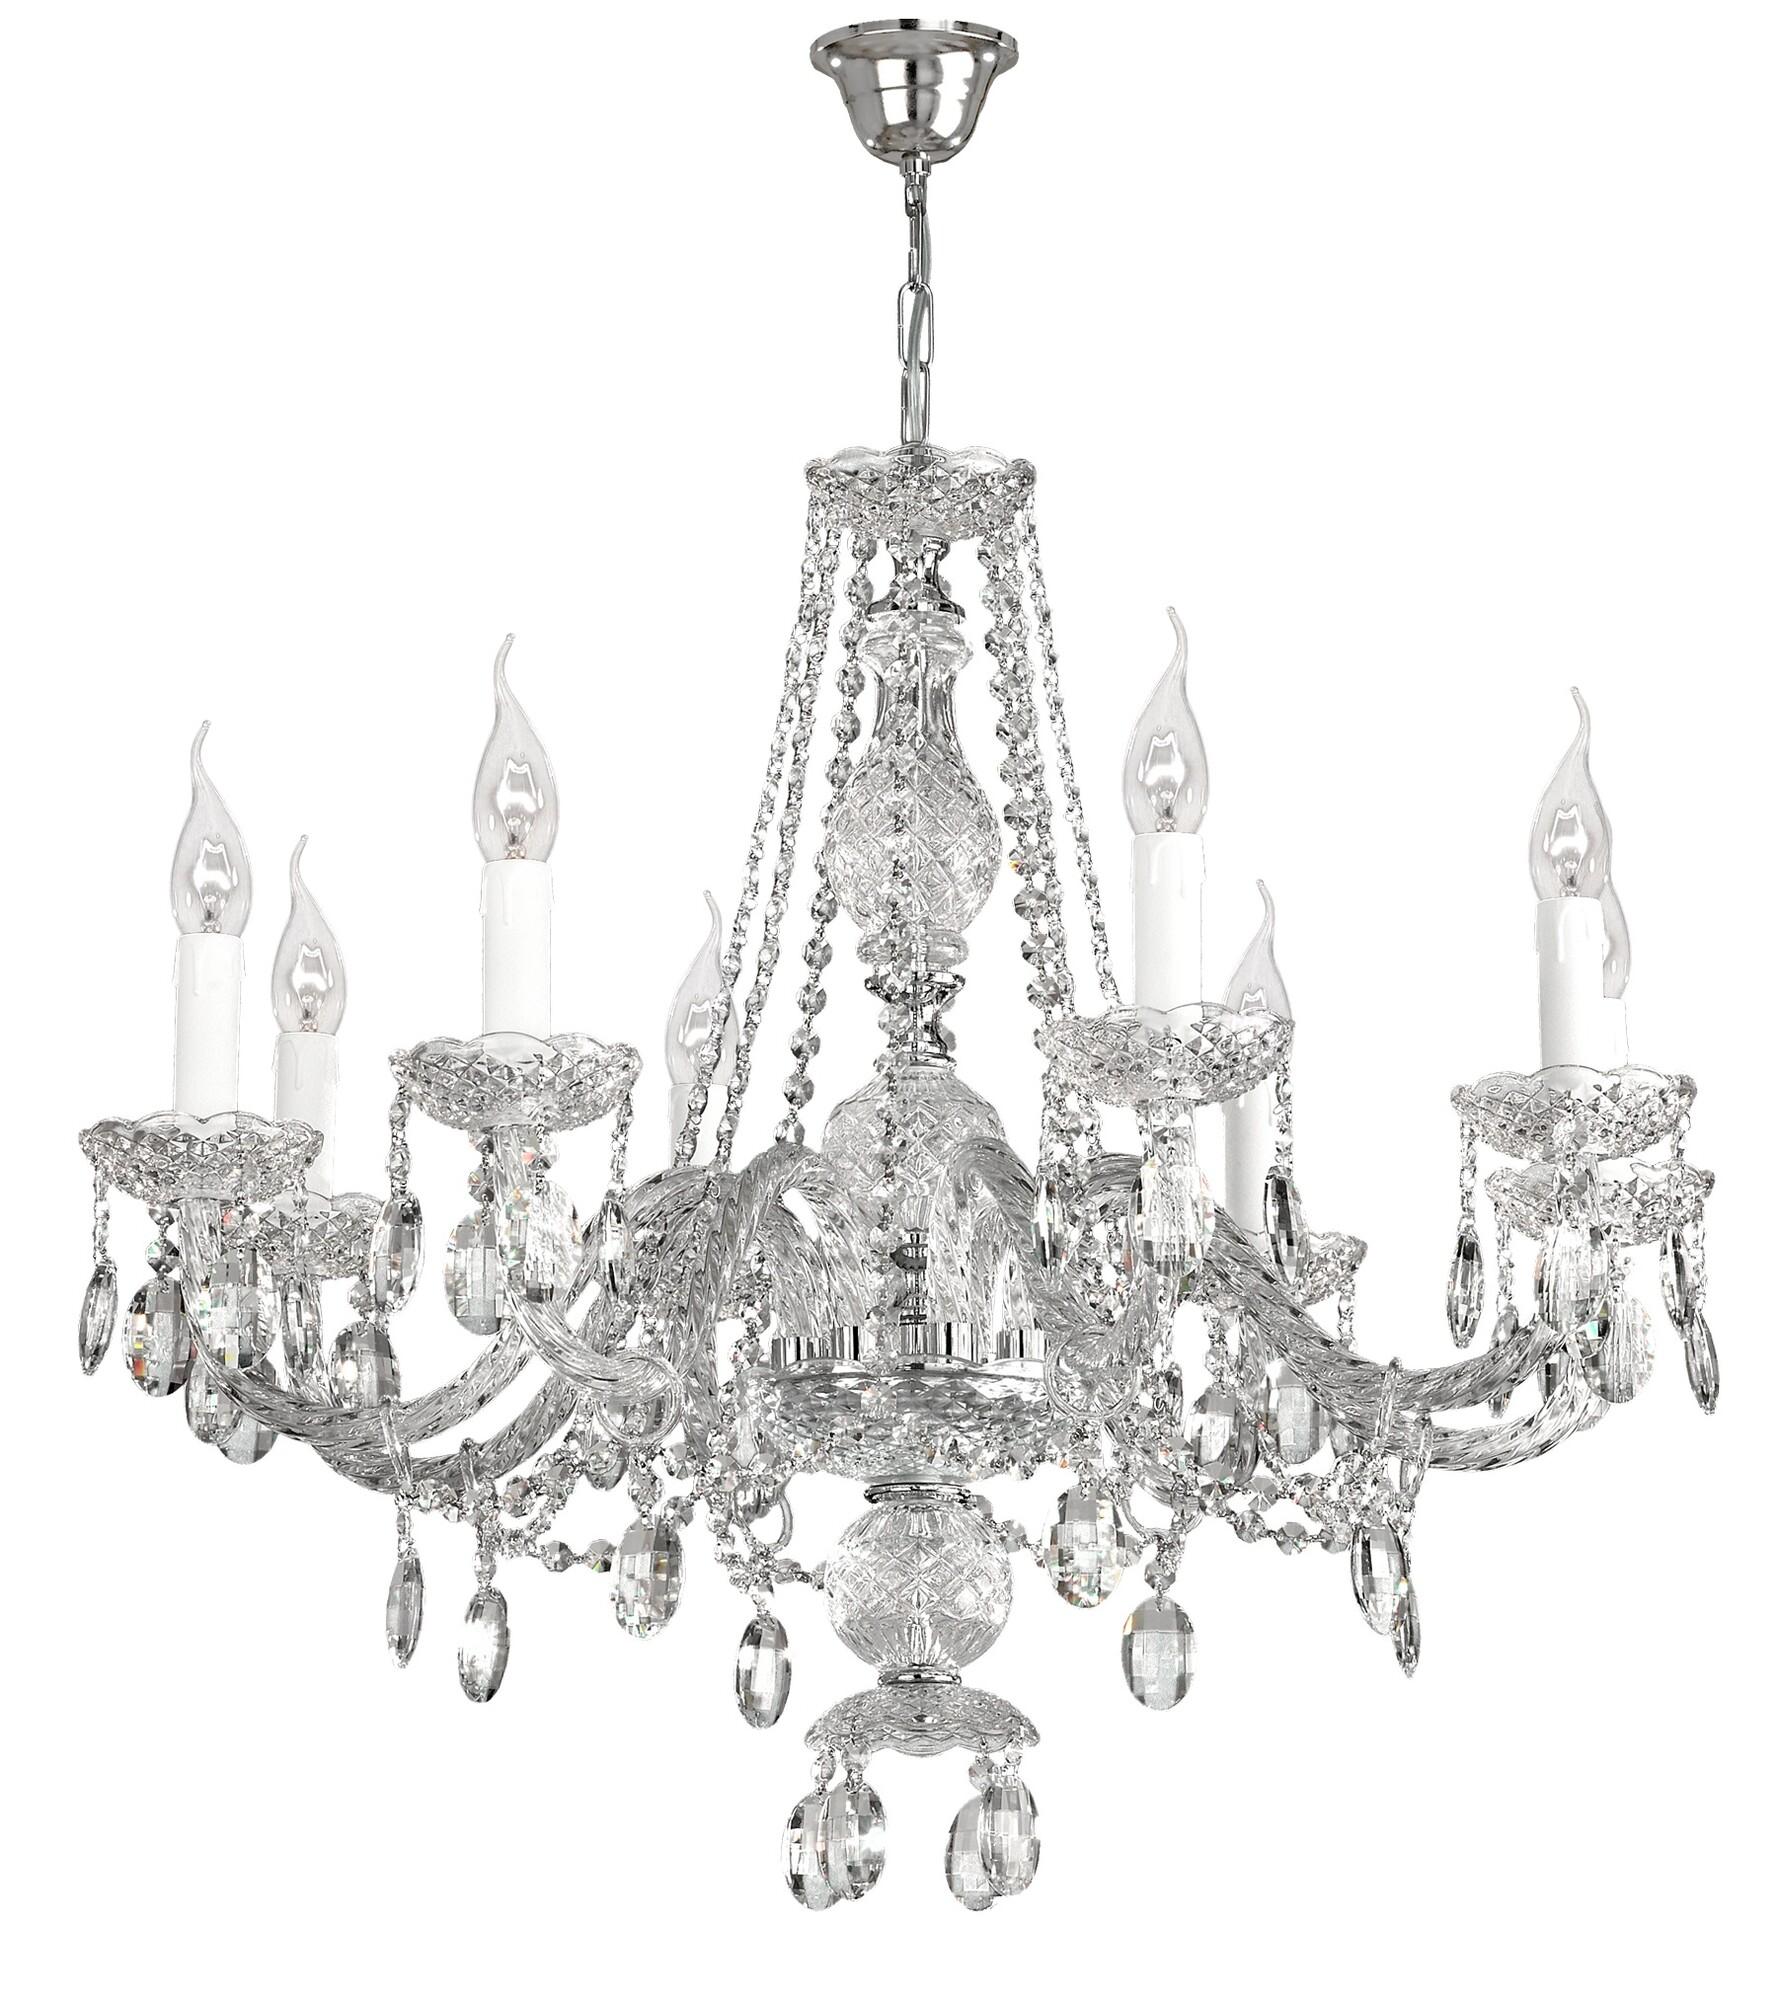 CRYSTAL hanglampen